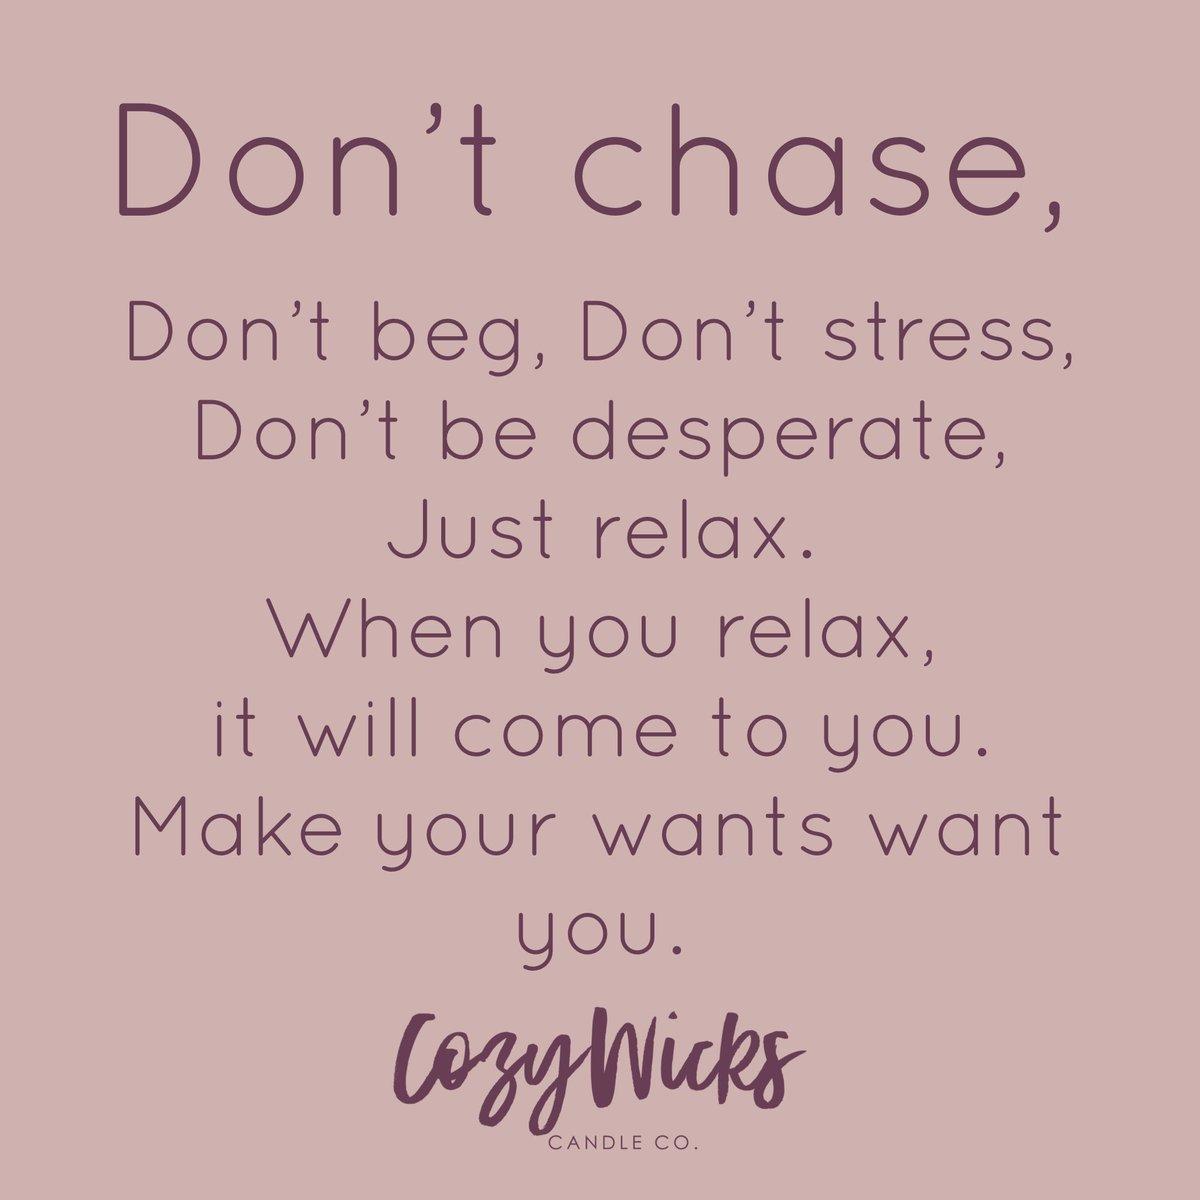 This is a whole word to live by. It relieves a ton of stress when you relax, let go, and Let God.   . . . . . #mindfulness #letgo #peace #letgoandletgod #letgoofthepast #letgooffear #letgotogrow #letgoofnegativity #whatsforyou #bodymindspirit #trusttheprocess https://t.co/d3f9RVqK6W